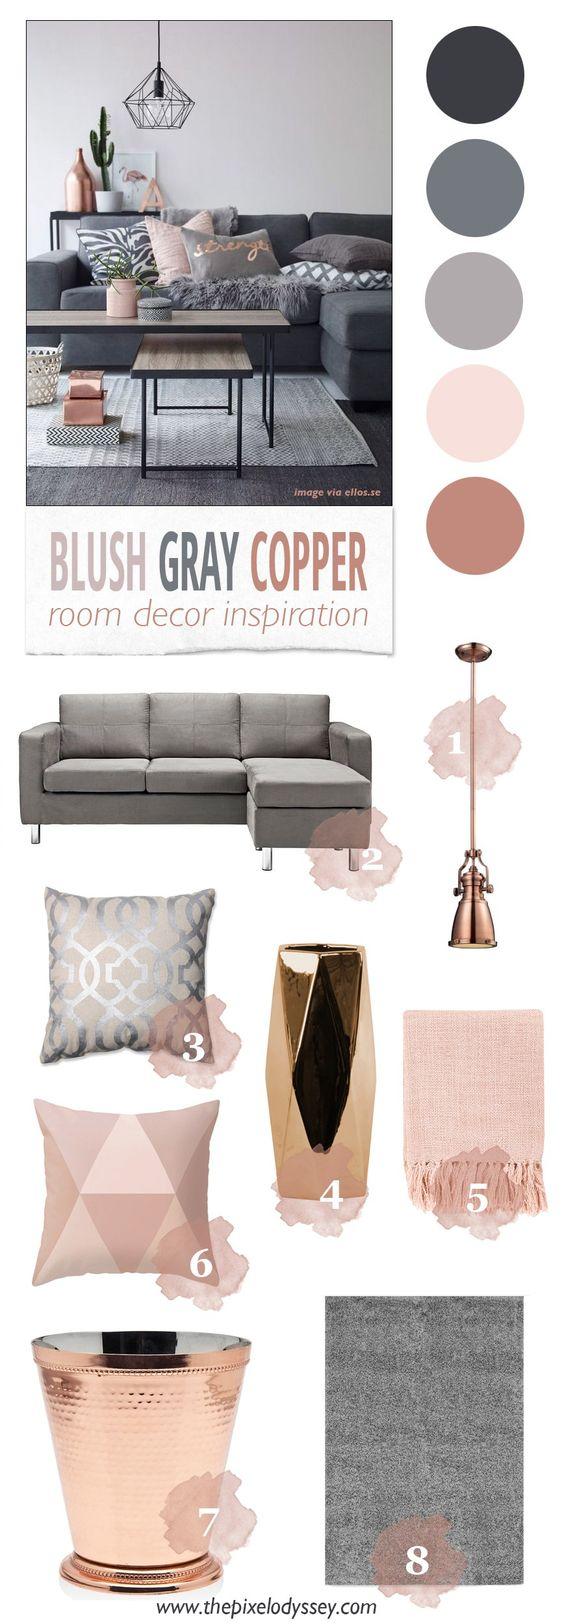 Blush Gray Copper Room Decor Inspiration - The Pixel Odyssey